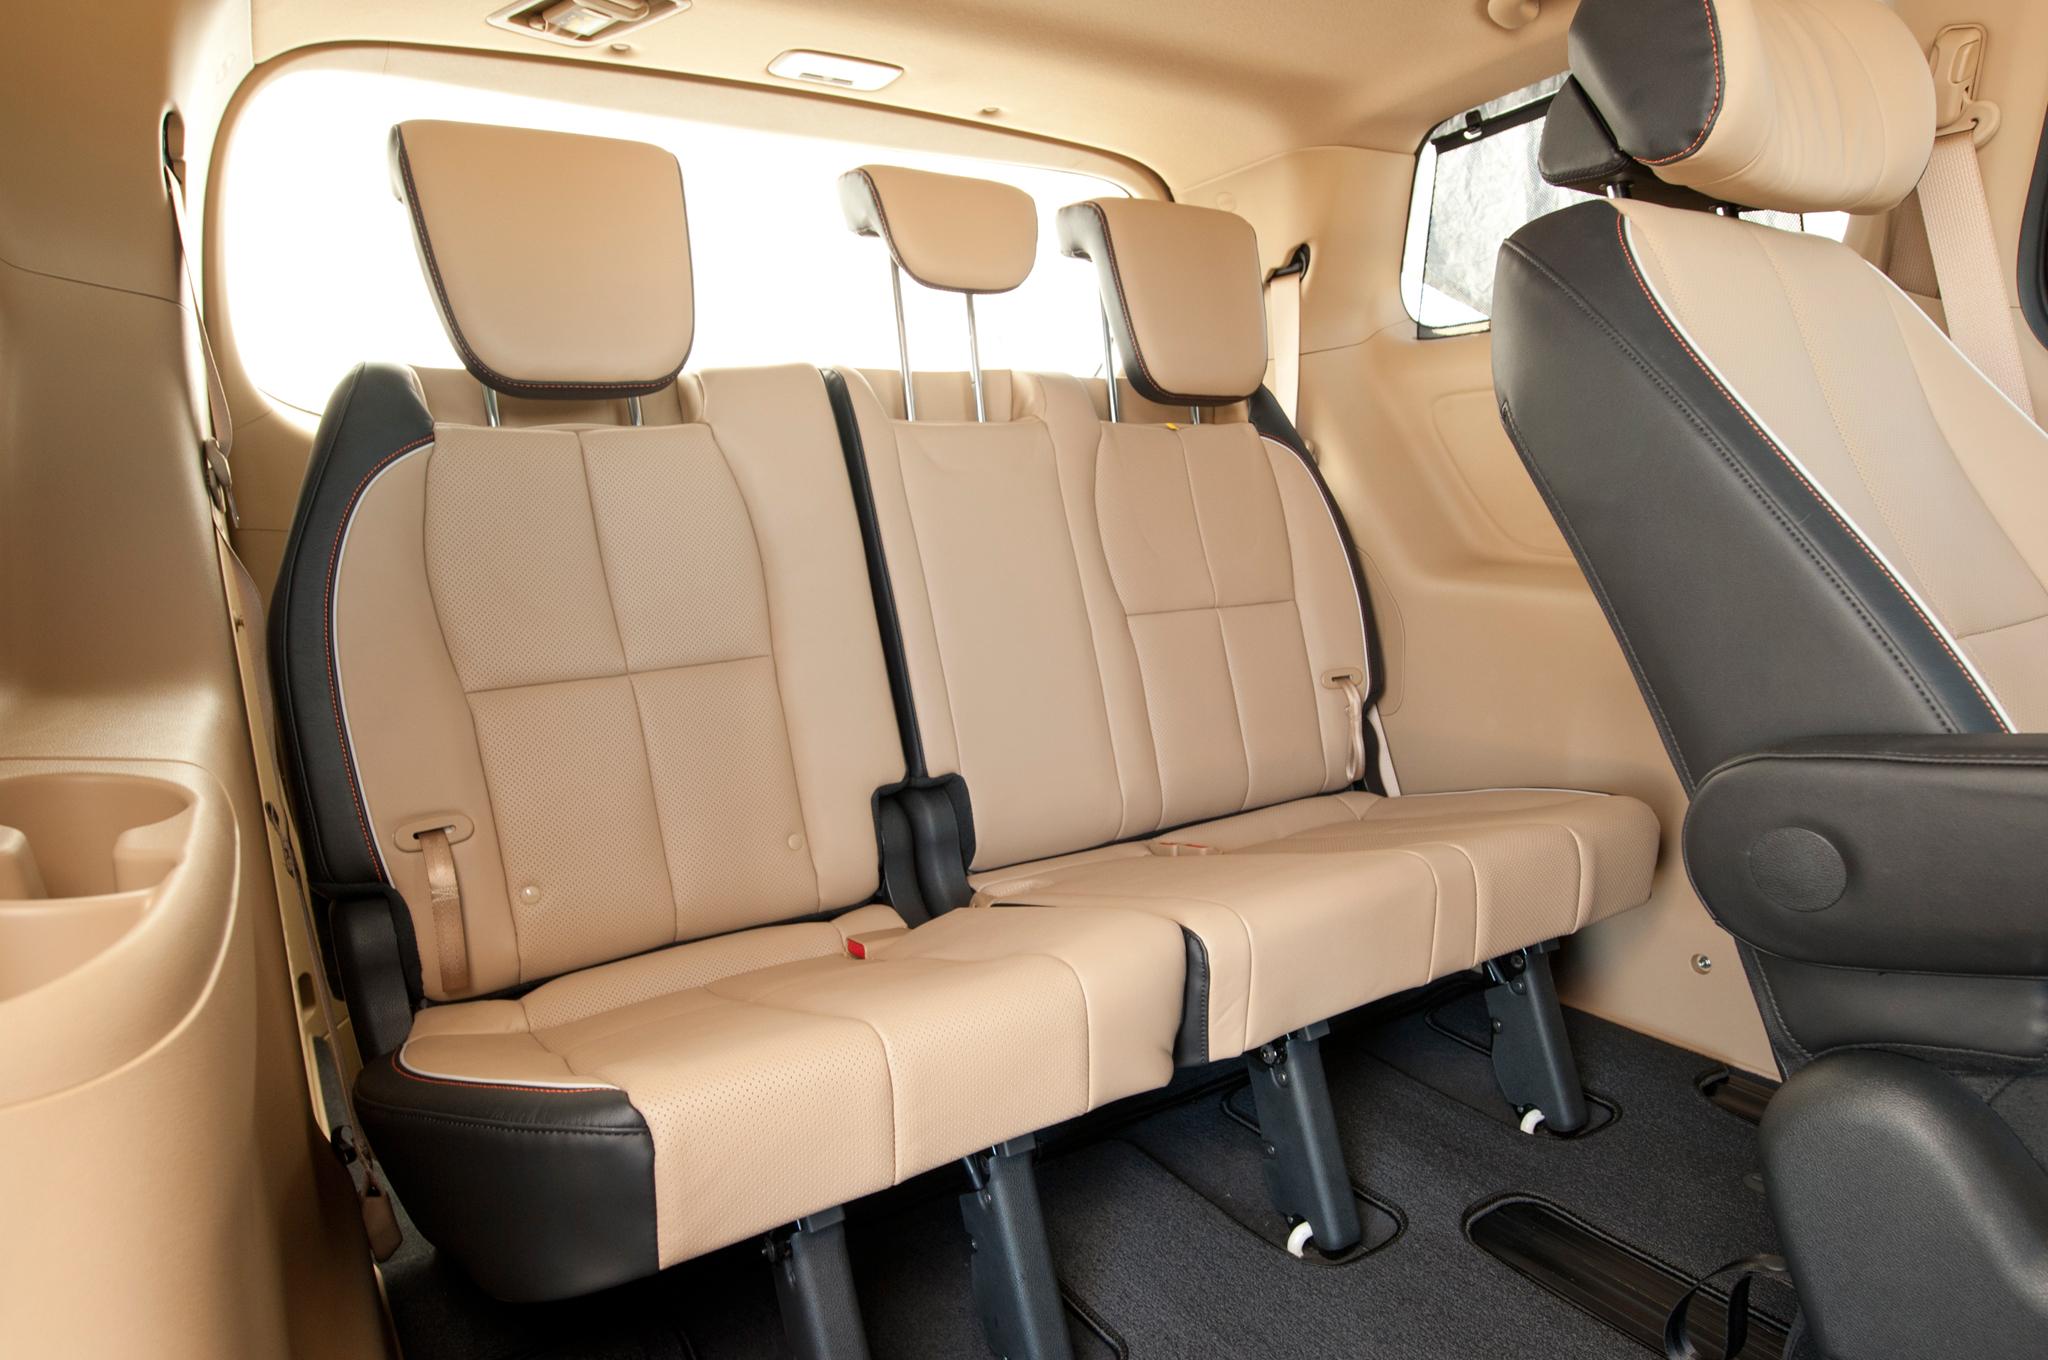 driving the cool minivan 2015 kia sedona 760 cars performance reviews and test drive. Black Bedroom Furniture Sets. Home Design Ideas